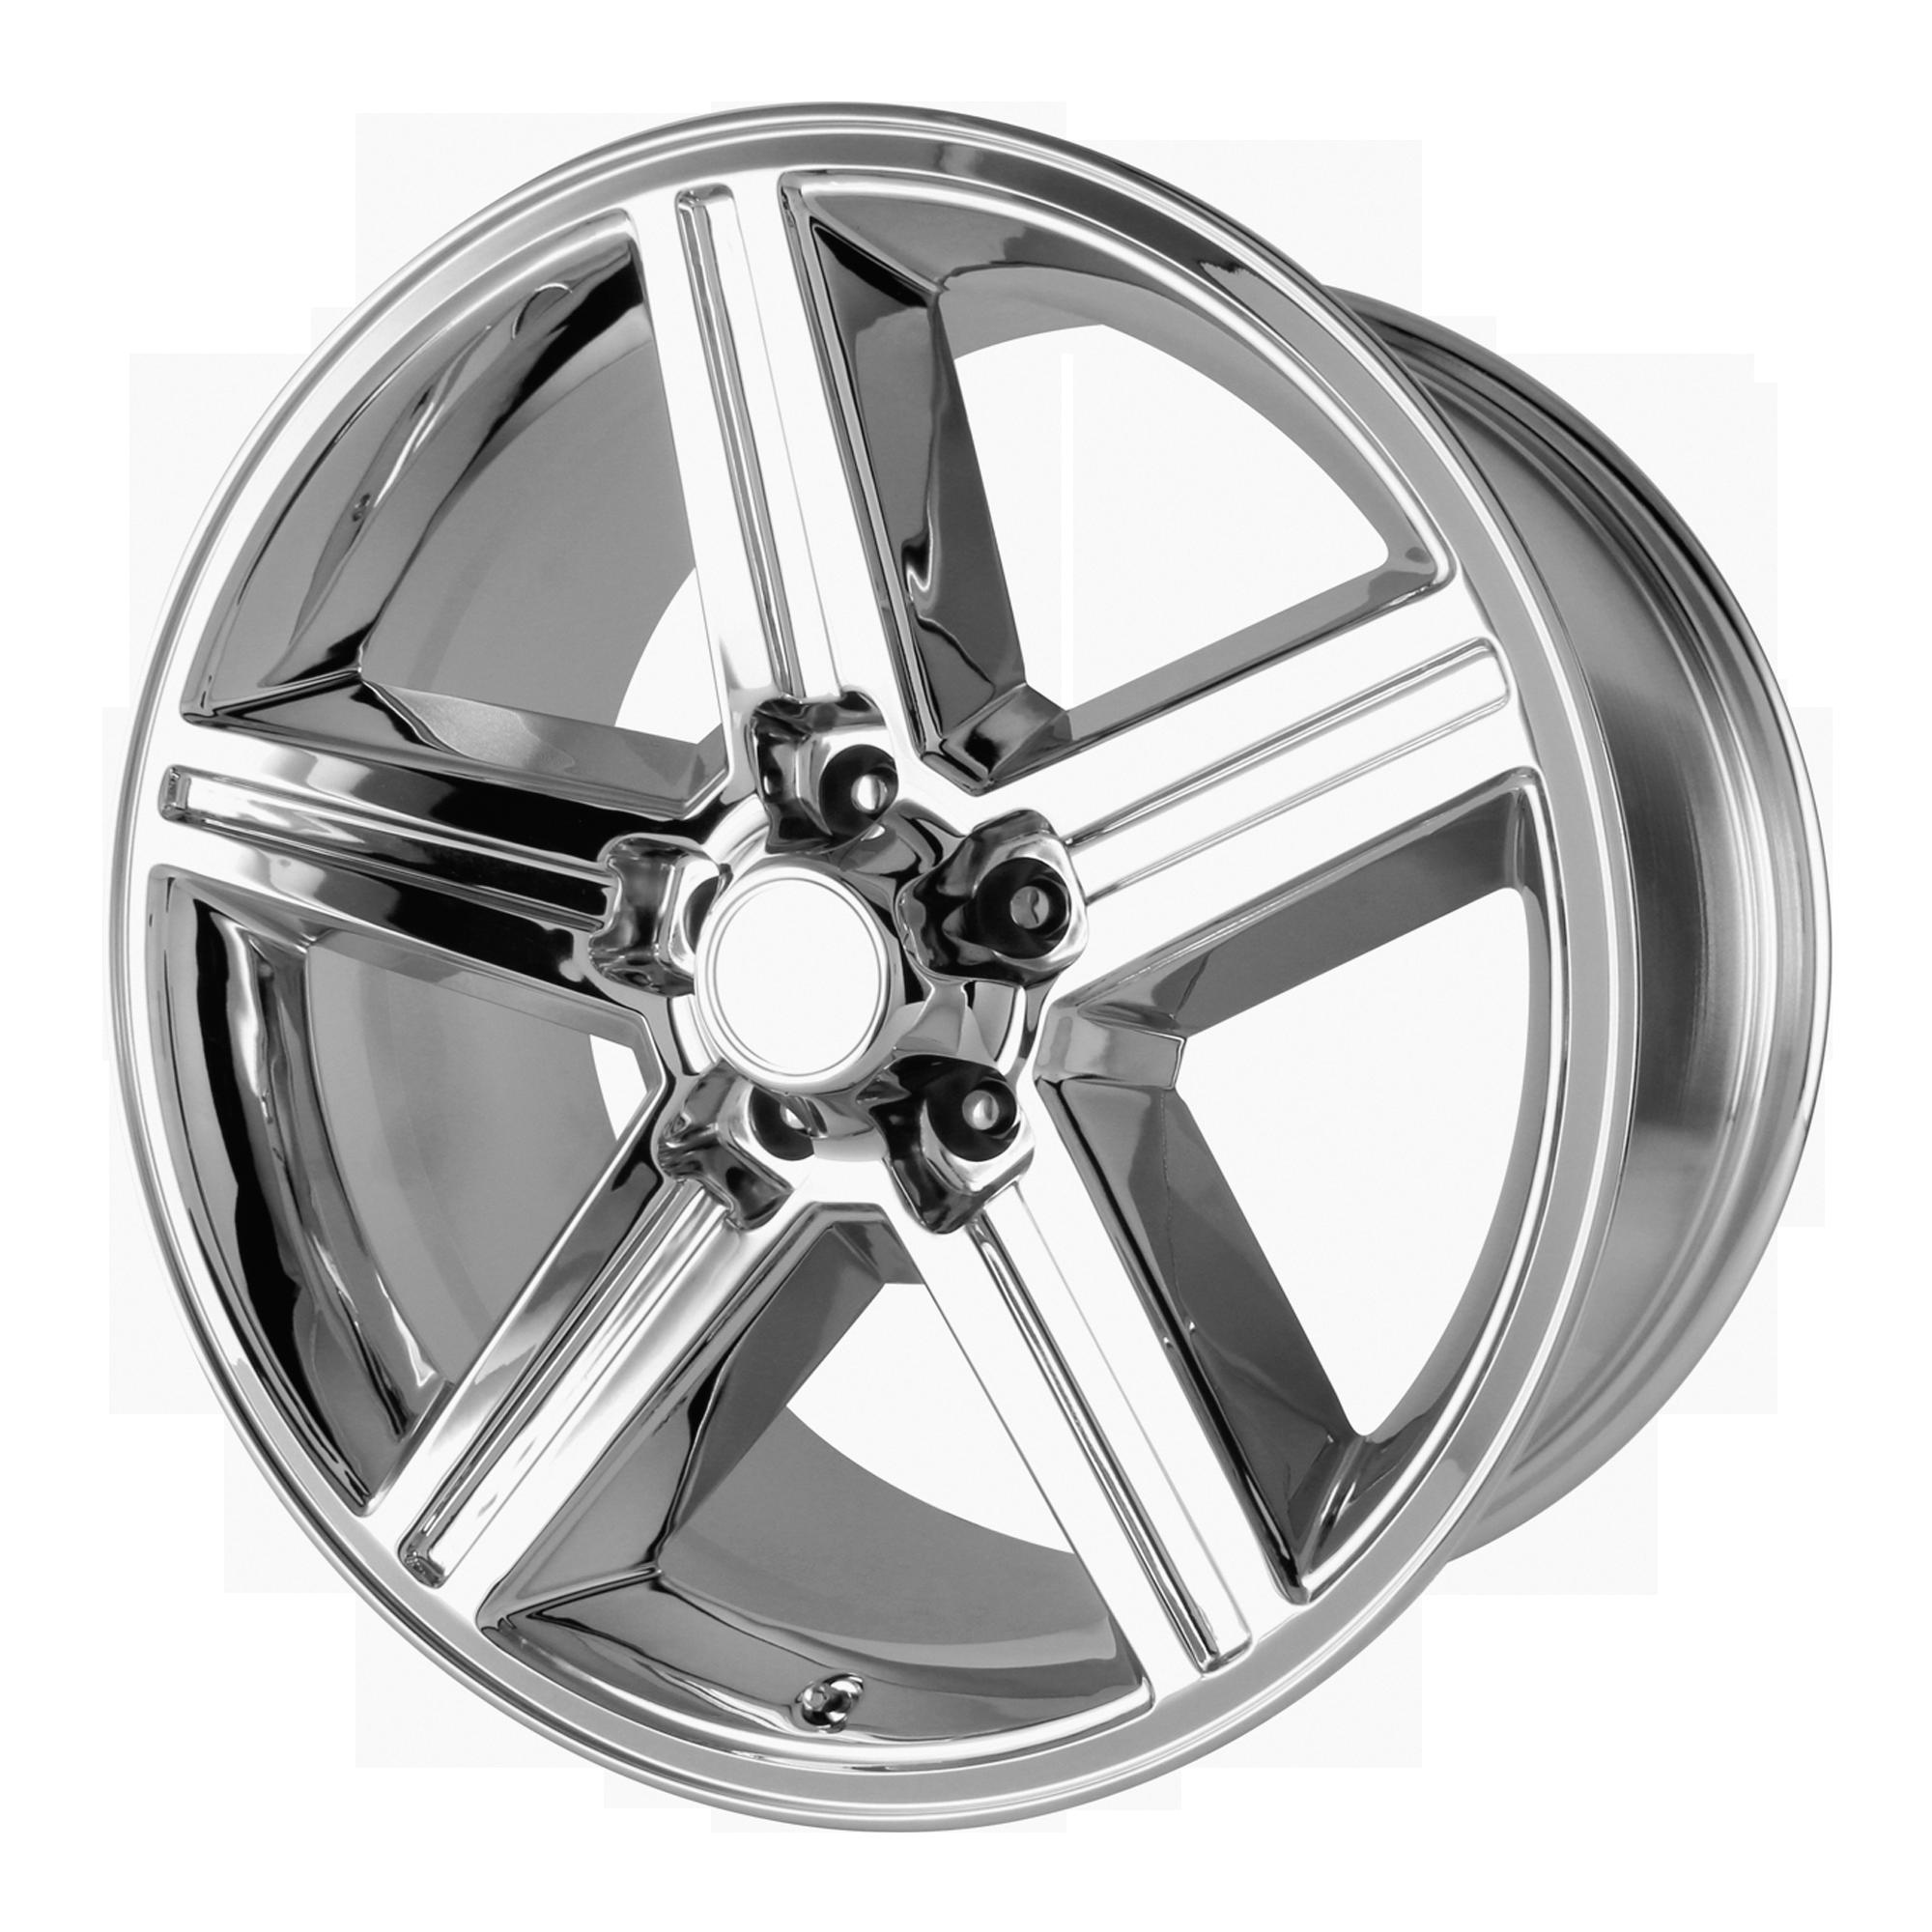 OE Creations Replica Wheels OE Creations PR148 Chrome